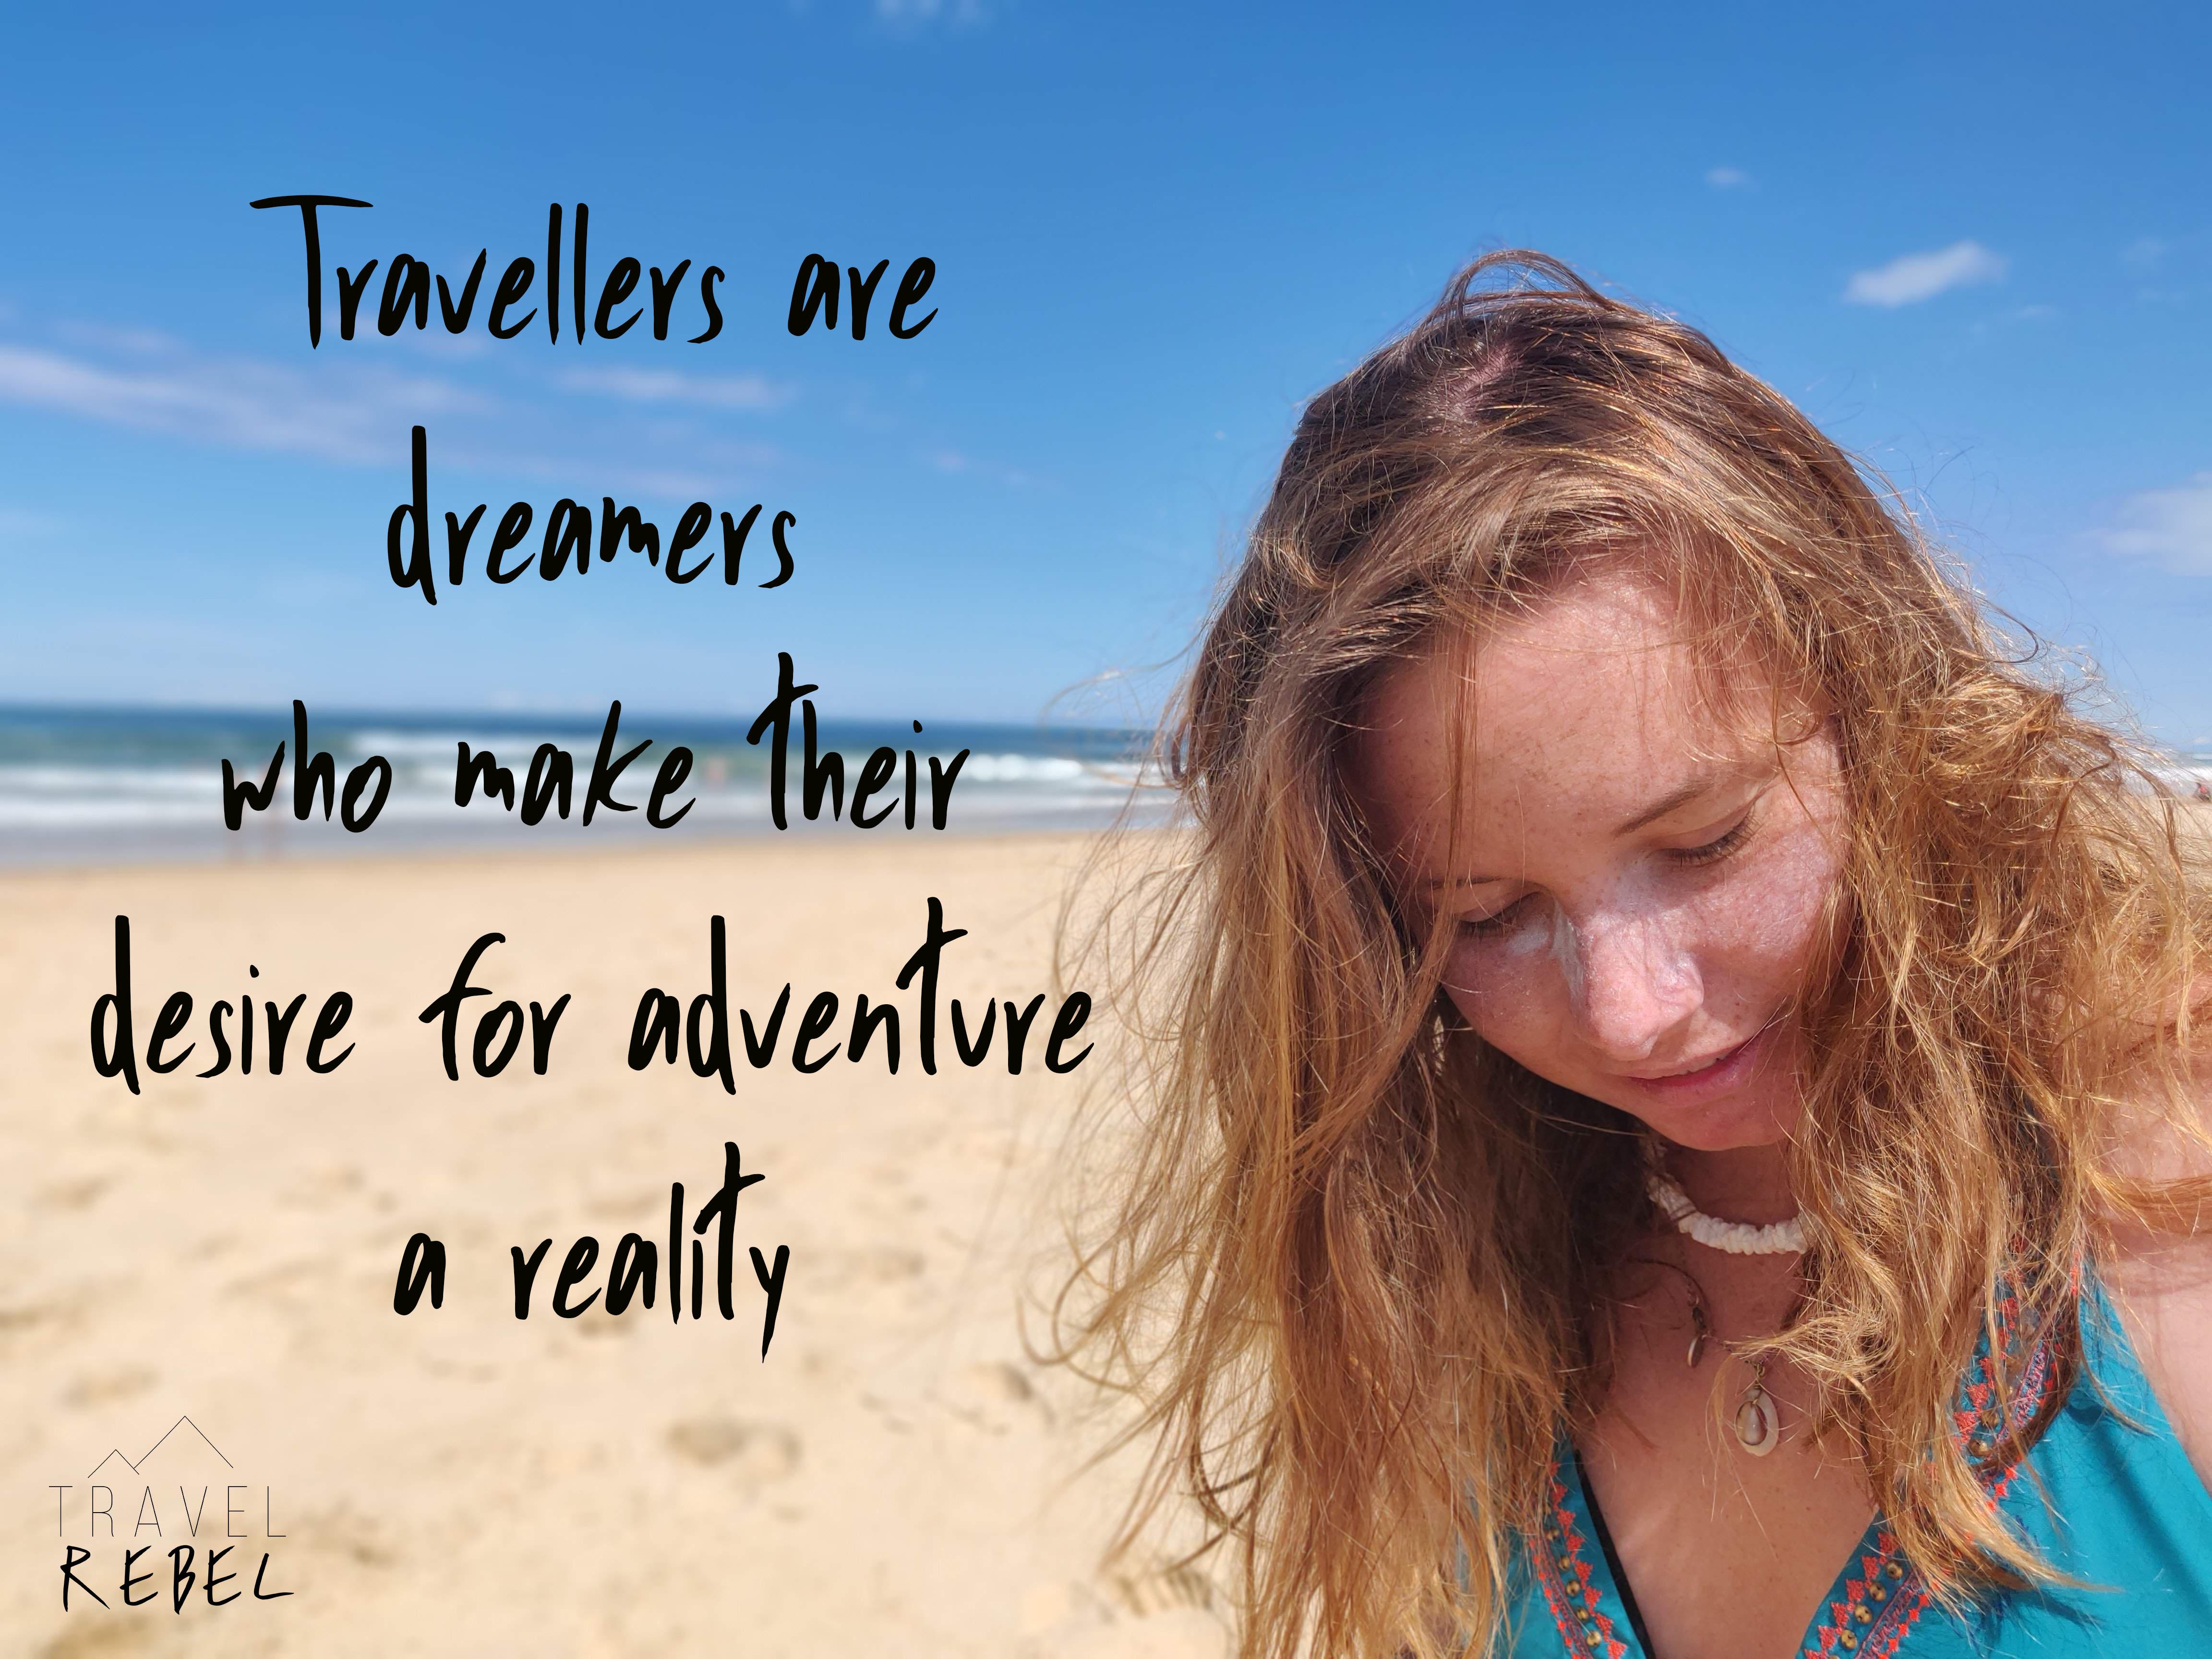 couchsurfing - sustainable tourism - Travelrebel - Belgian travelblog